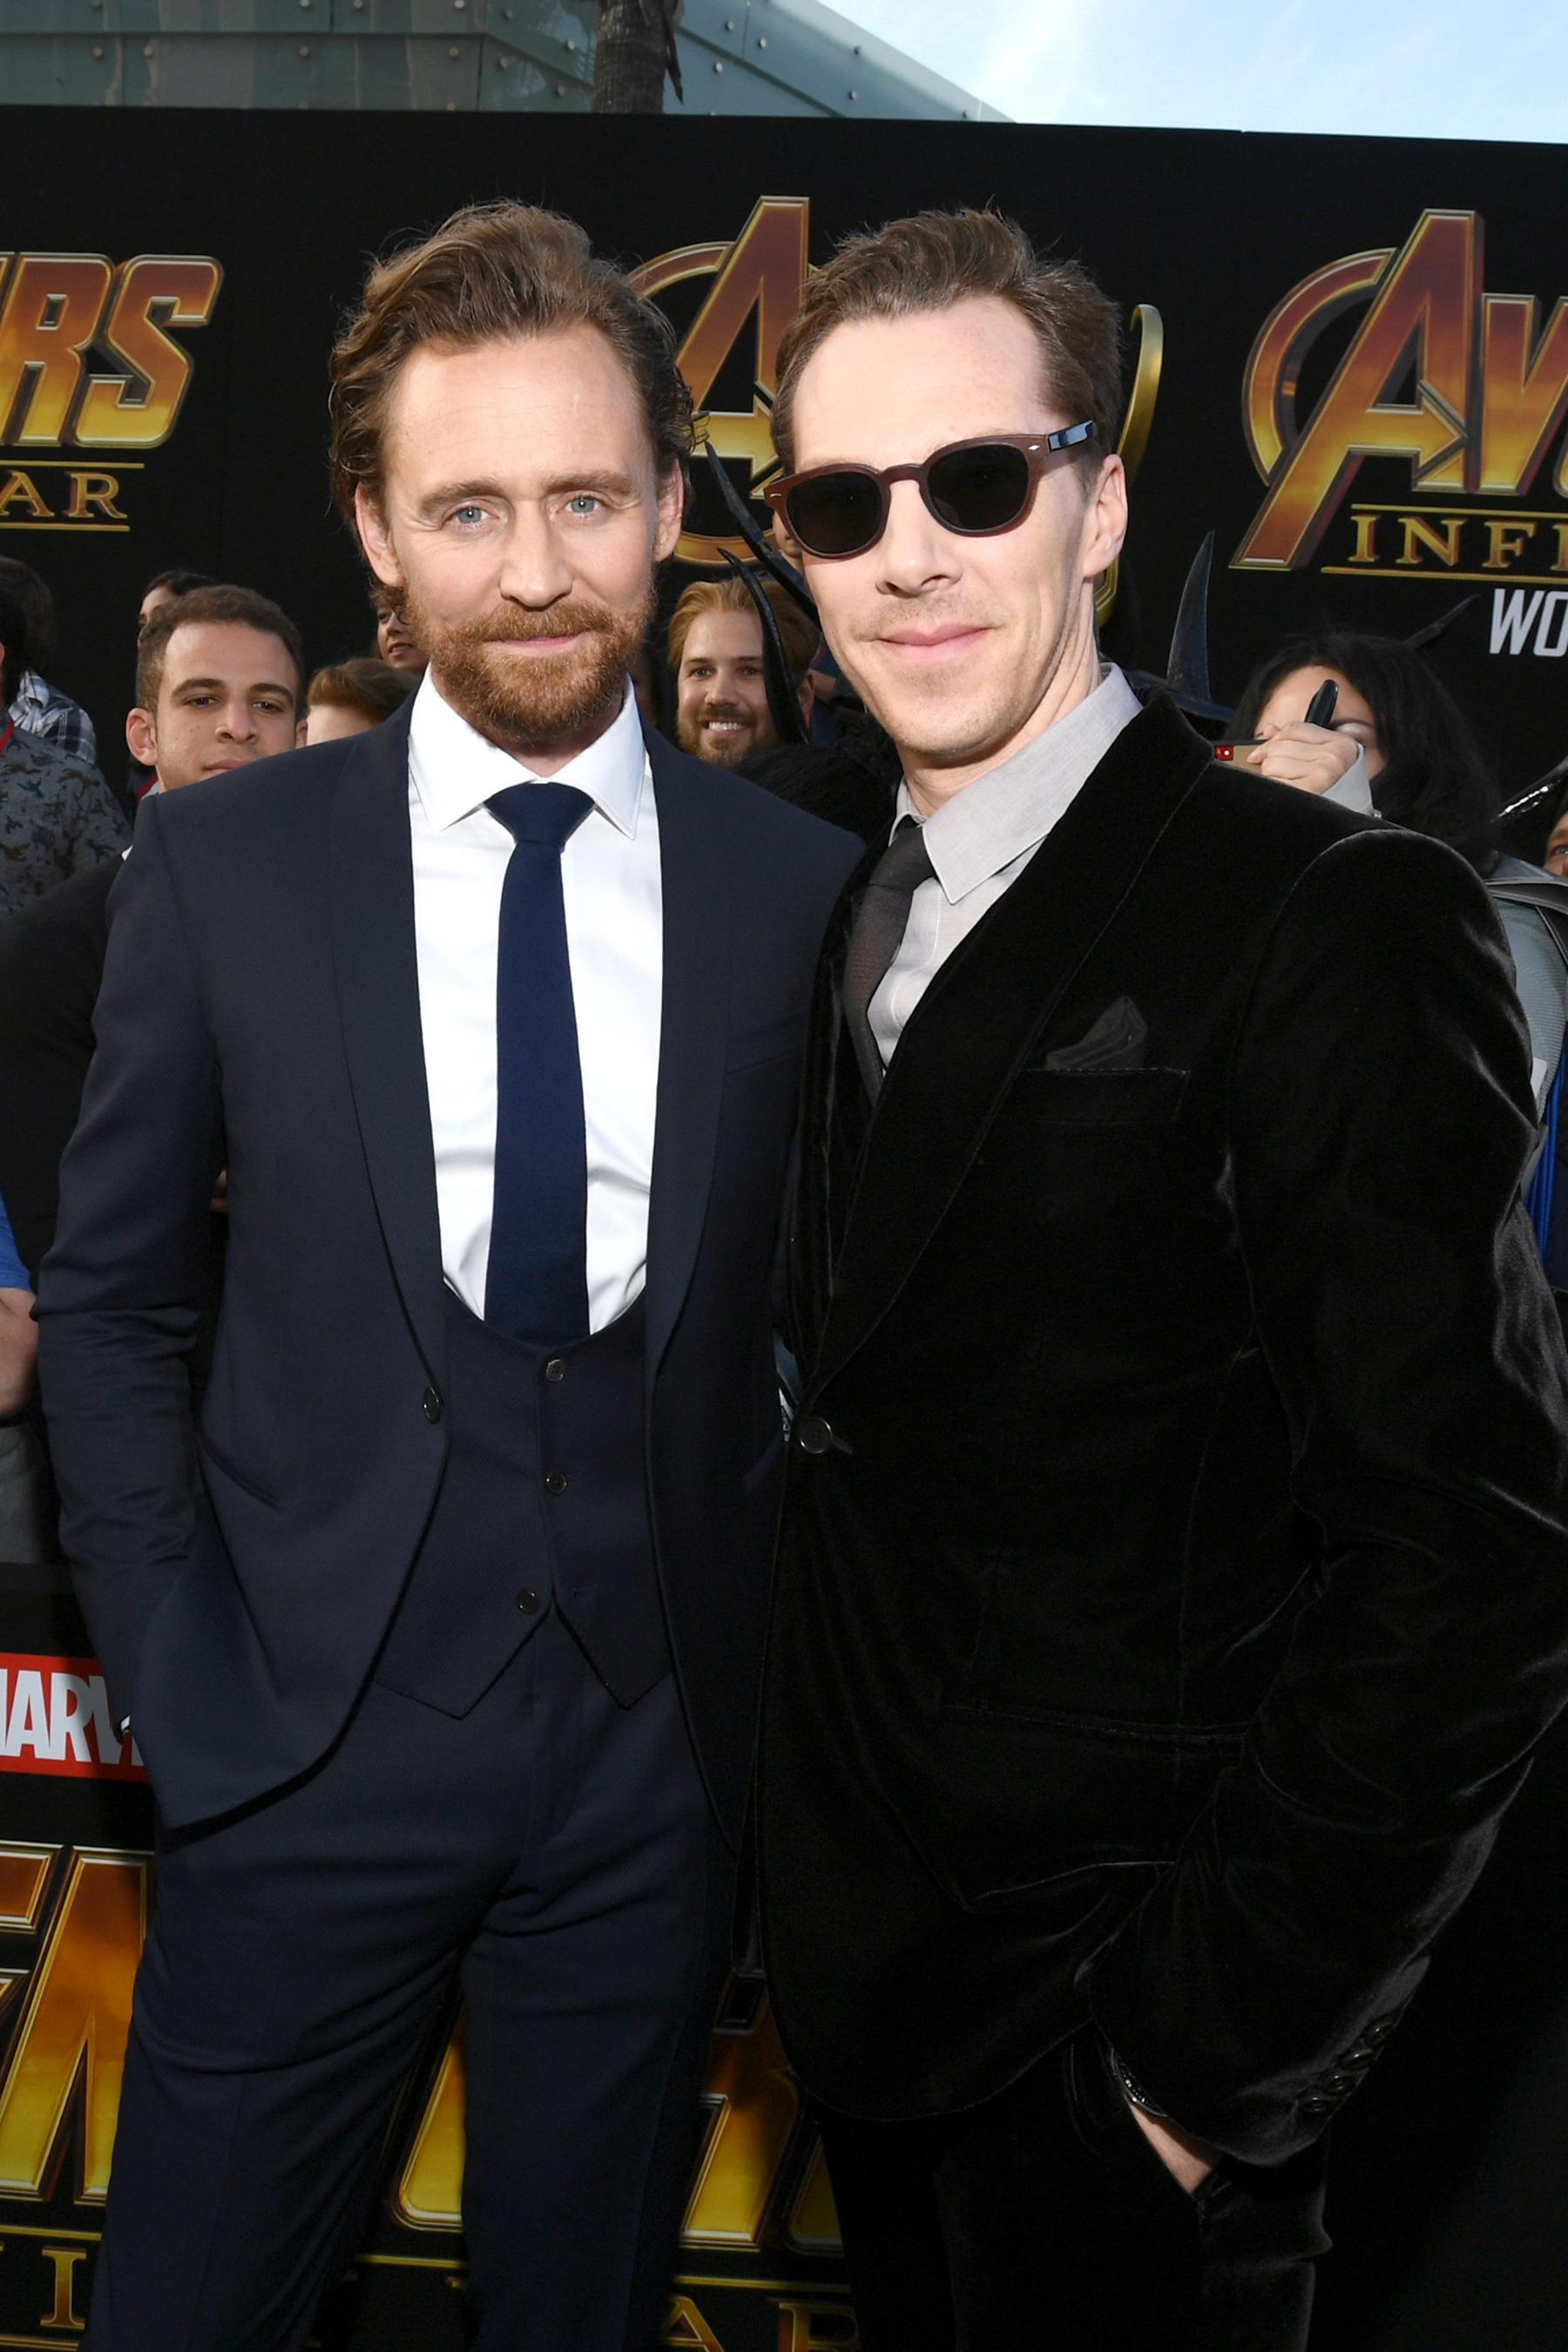 Tom Hiddleston és Benedict Cumberbatch